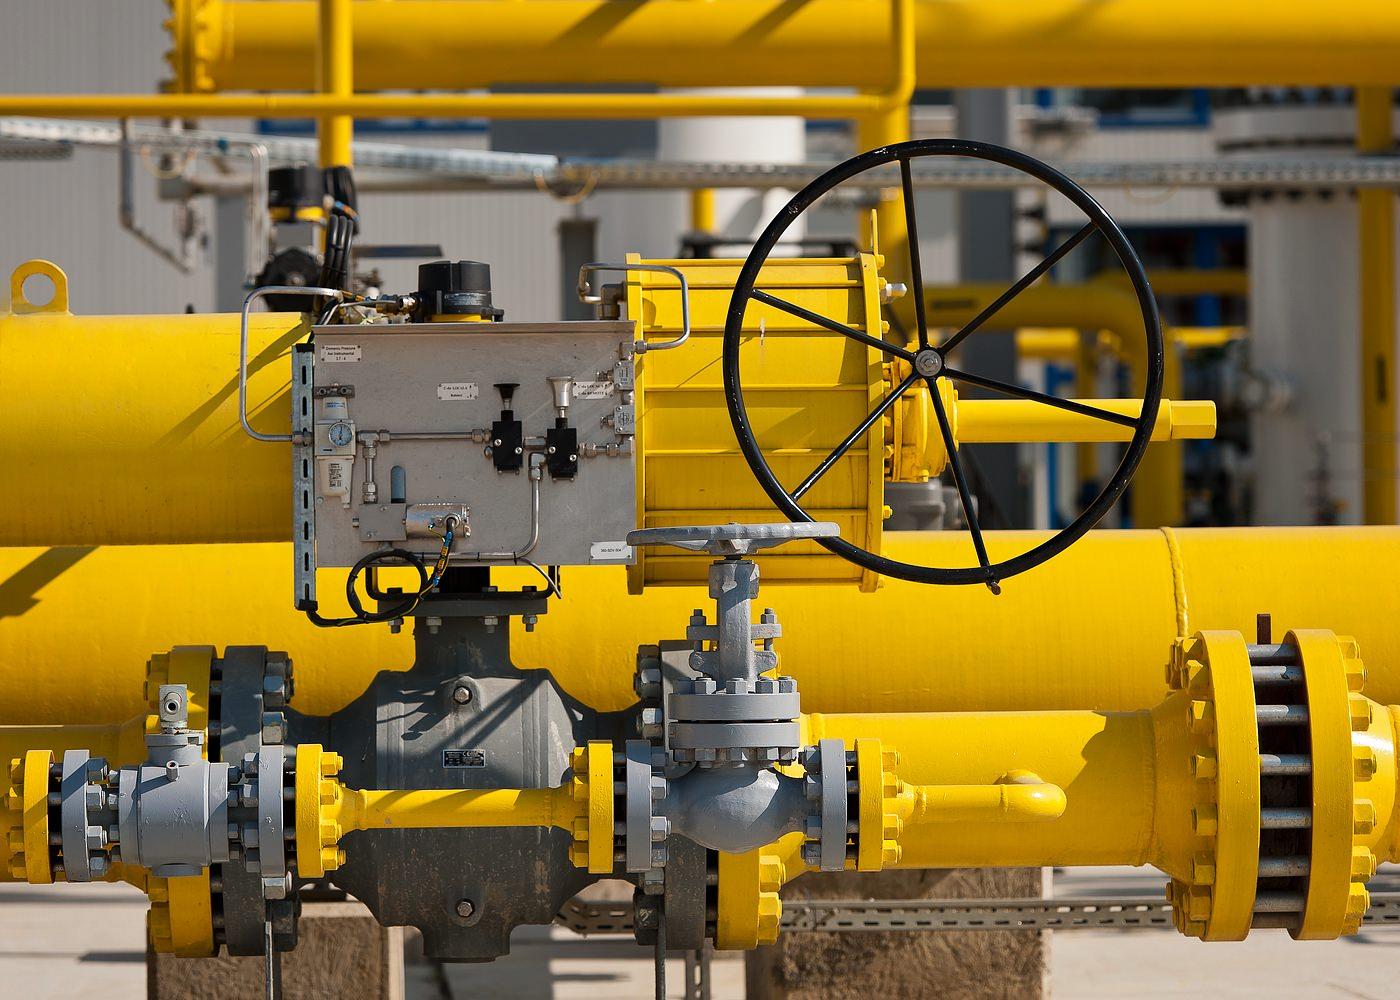 Detaliu statie de inmagazinare gaze naturale robinet cu sfera